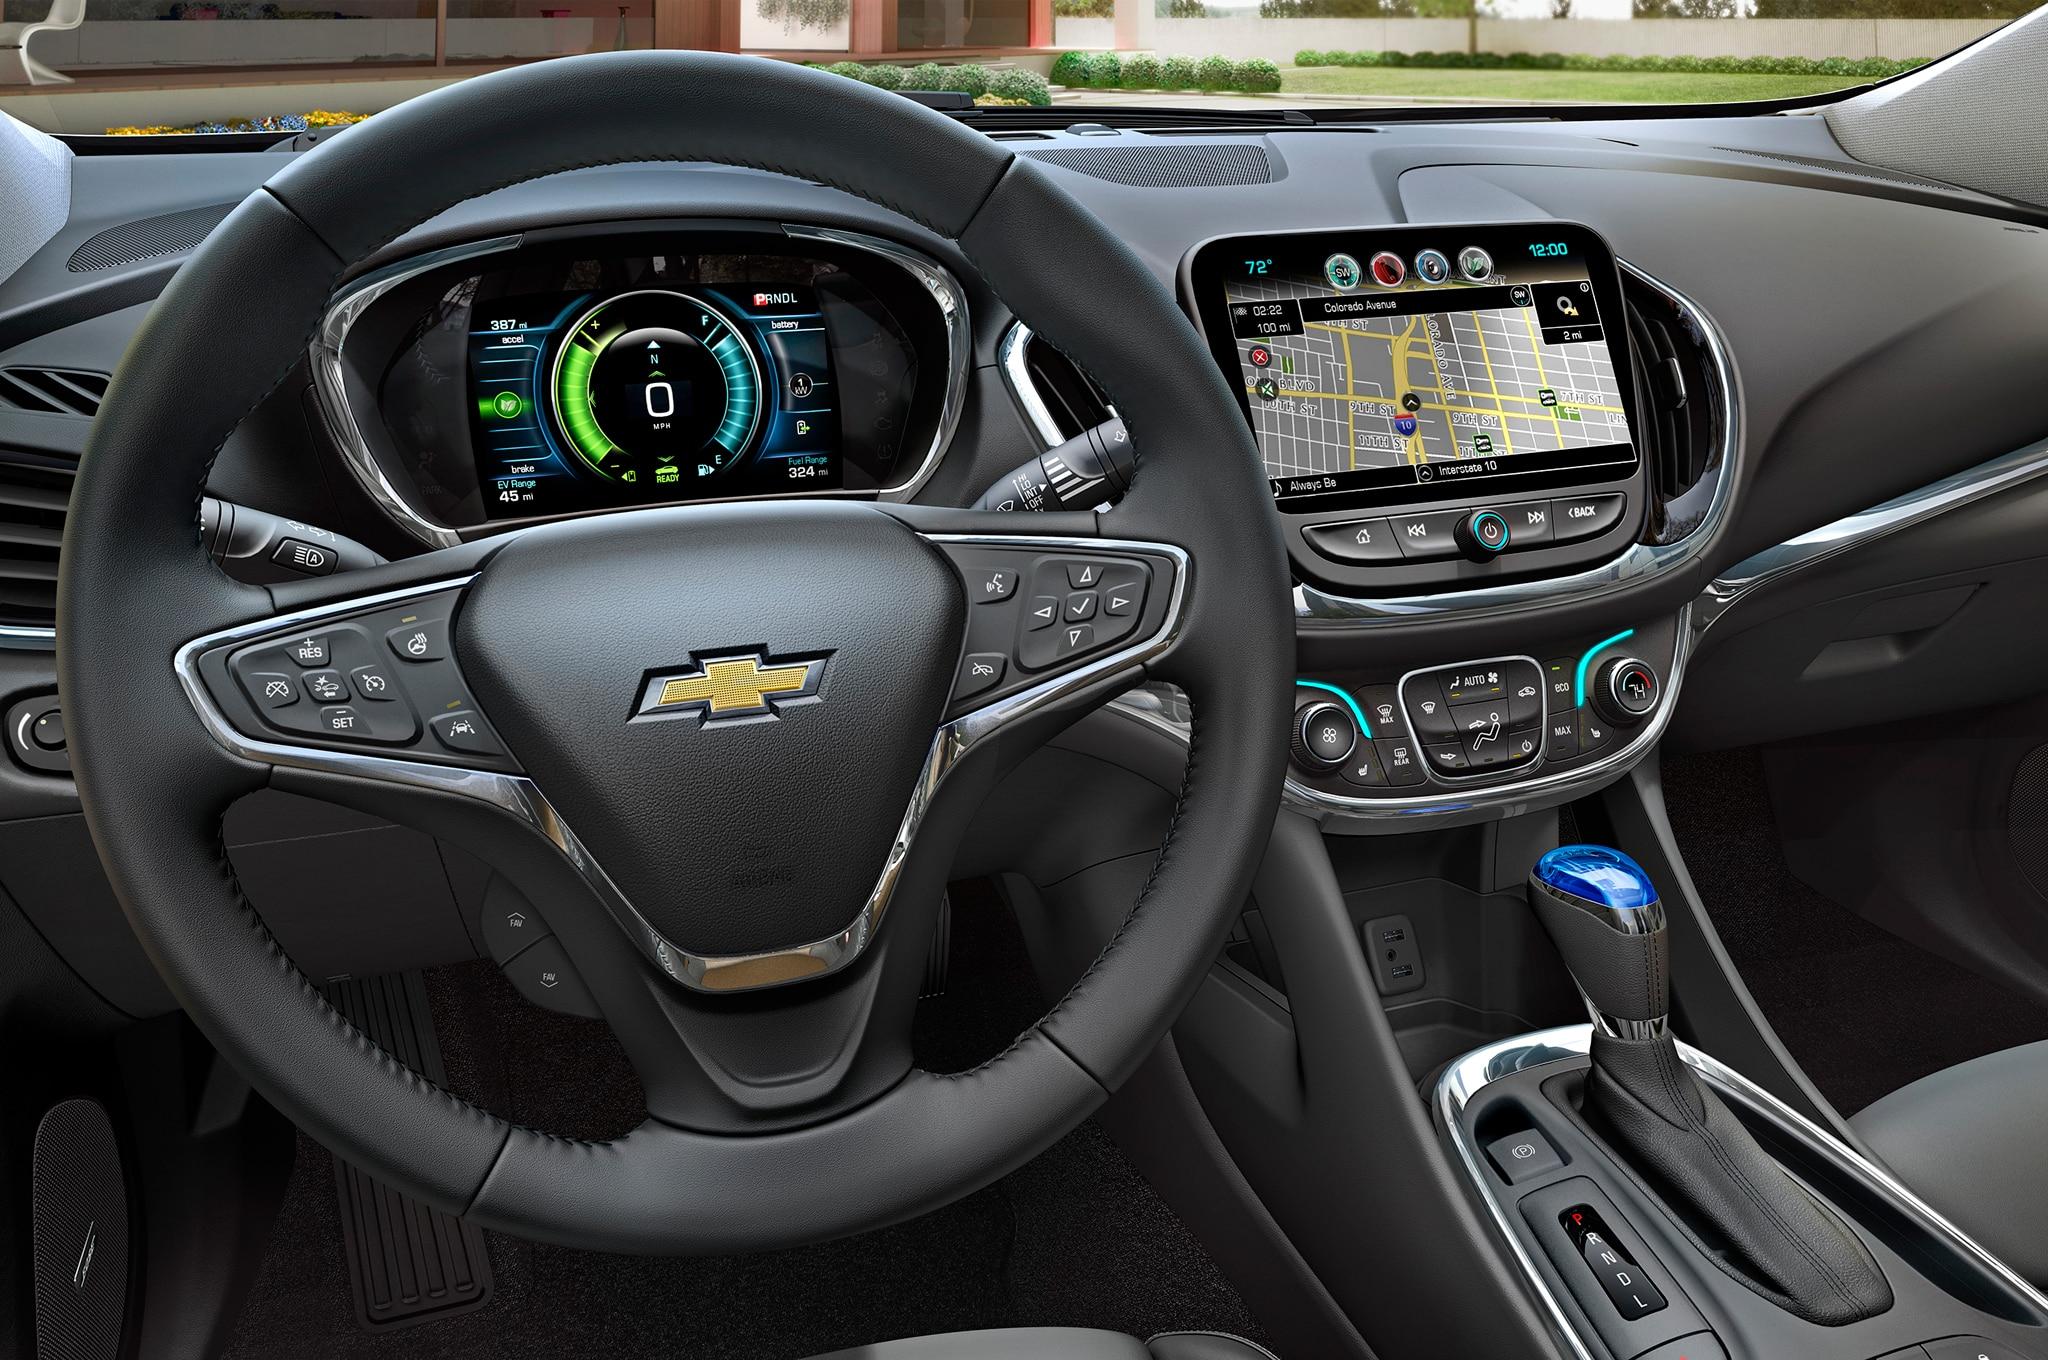 2016 Chevrolet Volt to Start at $33,995